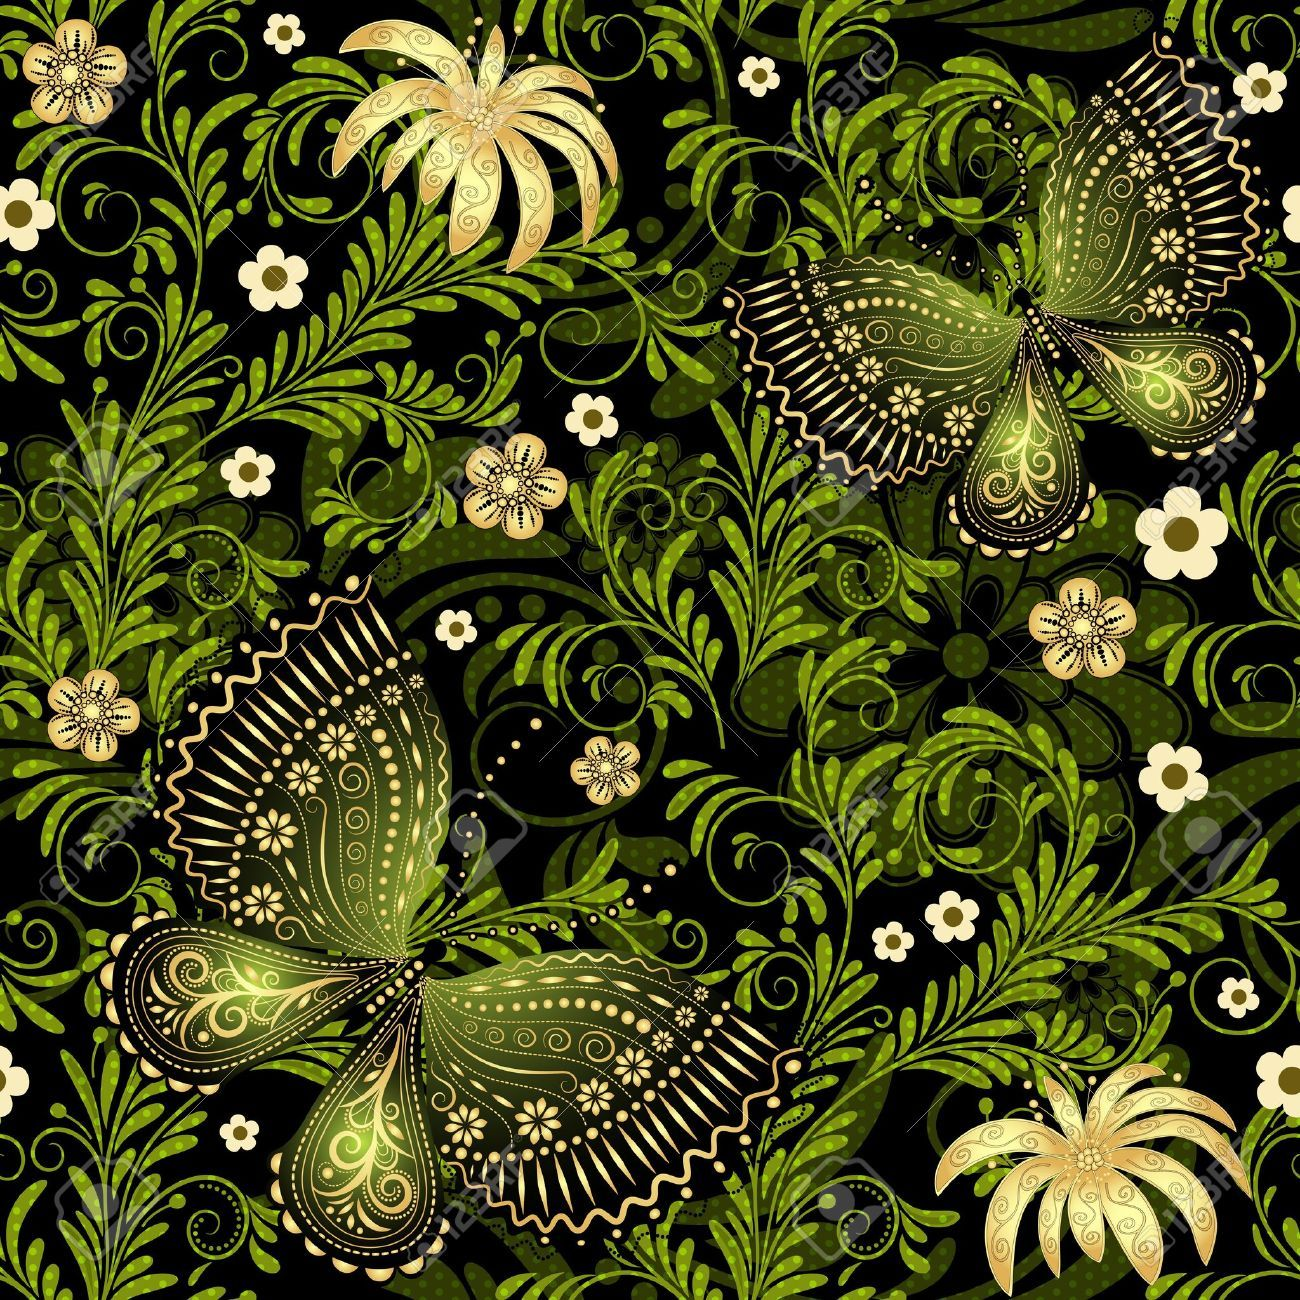 Springdarkandgreenseamlesspatternwithgoldflowers